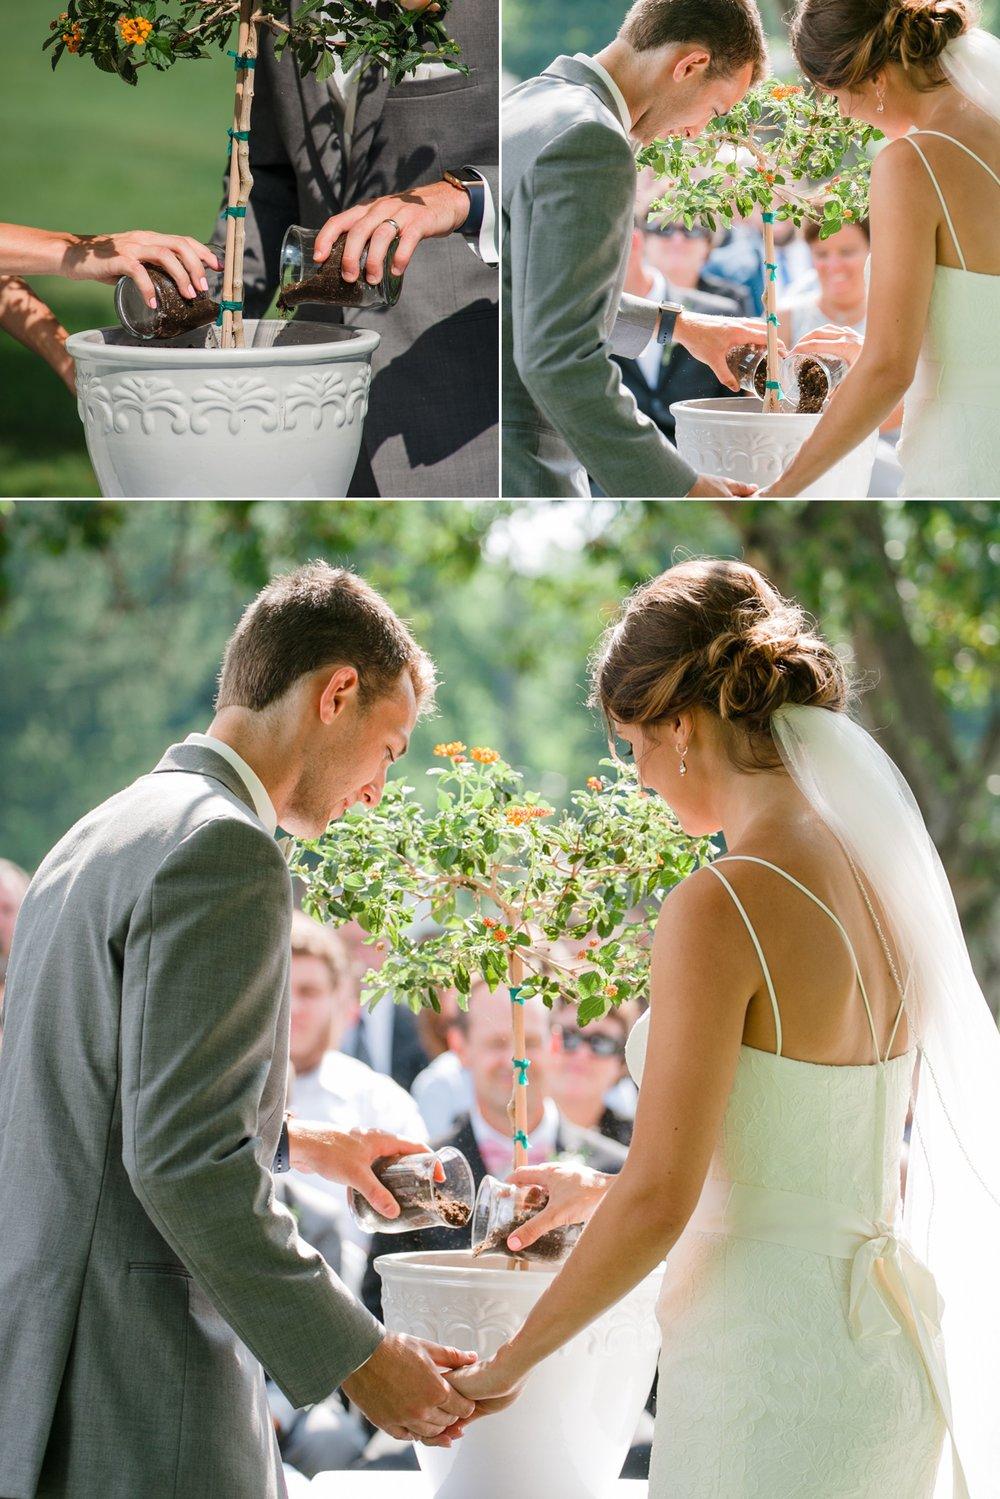 Highland-meadows-wedding-photos 15.jpg